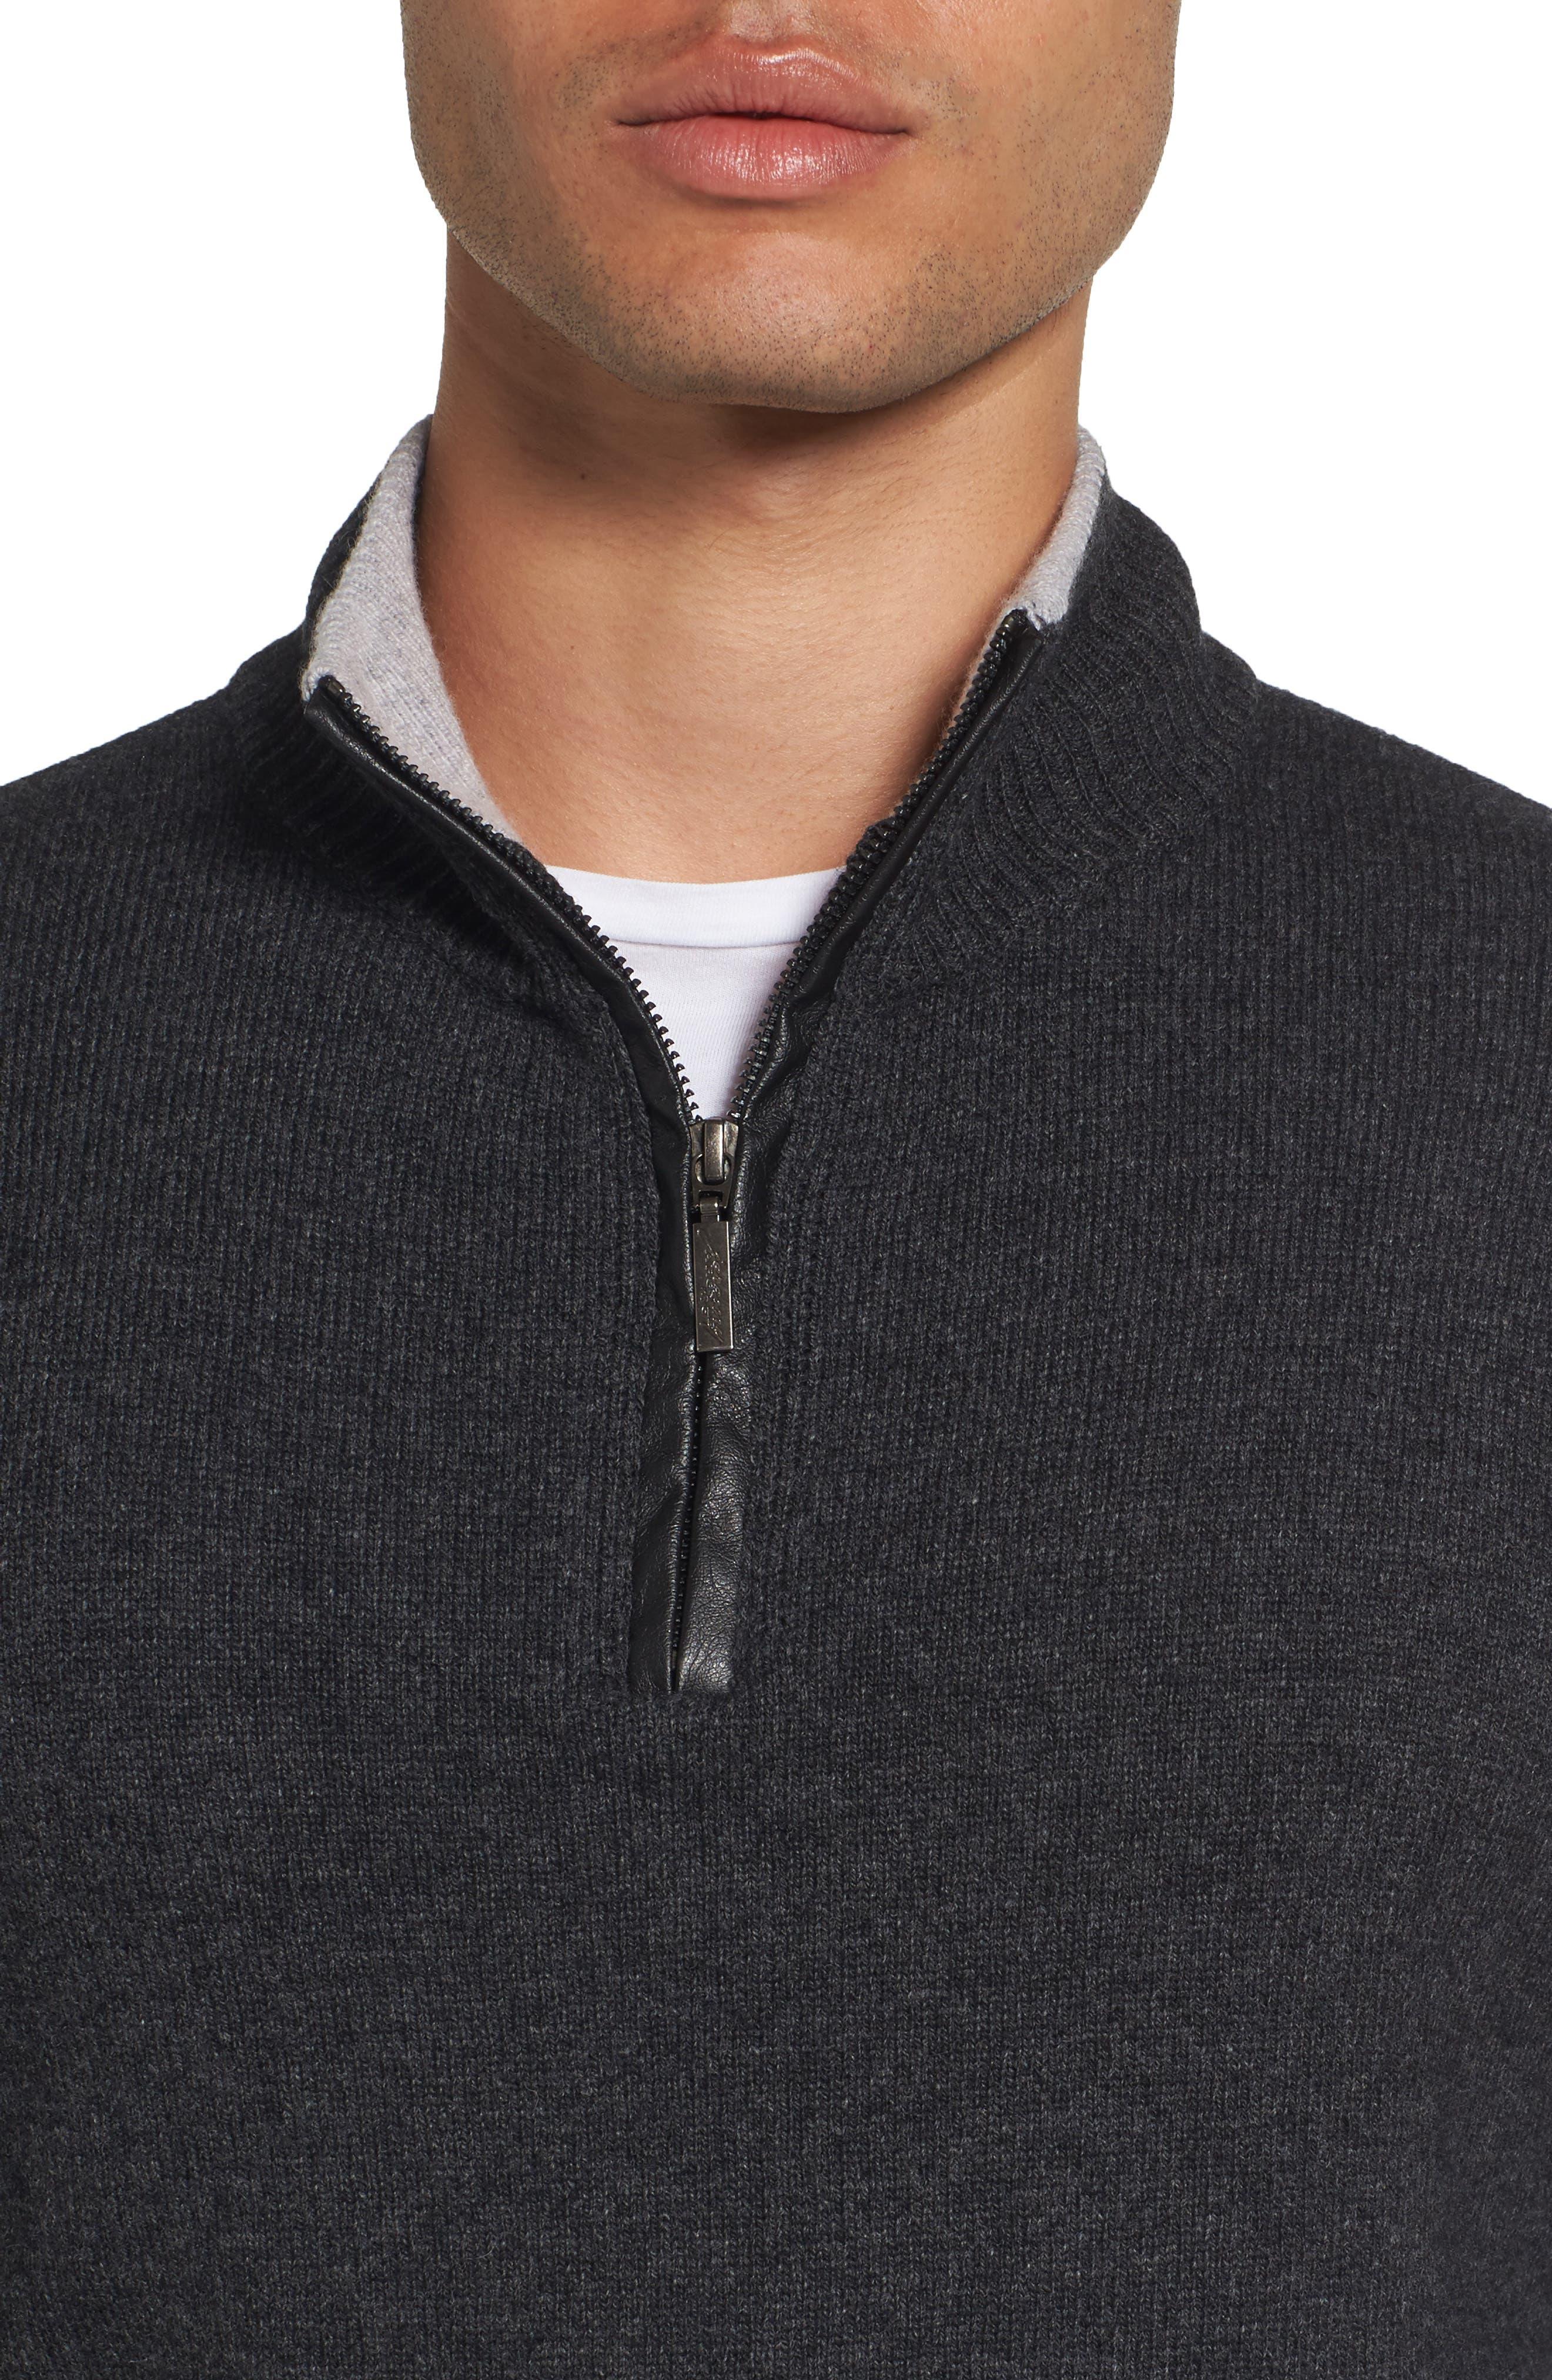 Wool Blend Quarter Zip Sweater,                             Alternate thumbnail 4, color,                             Dark Grey